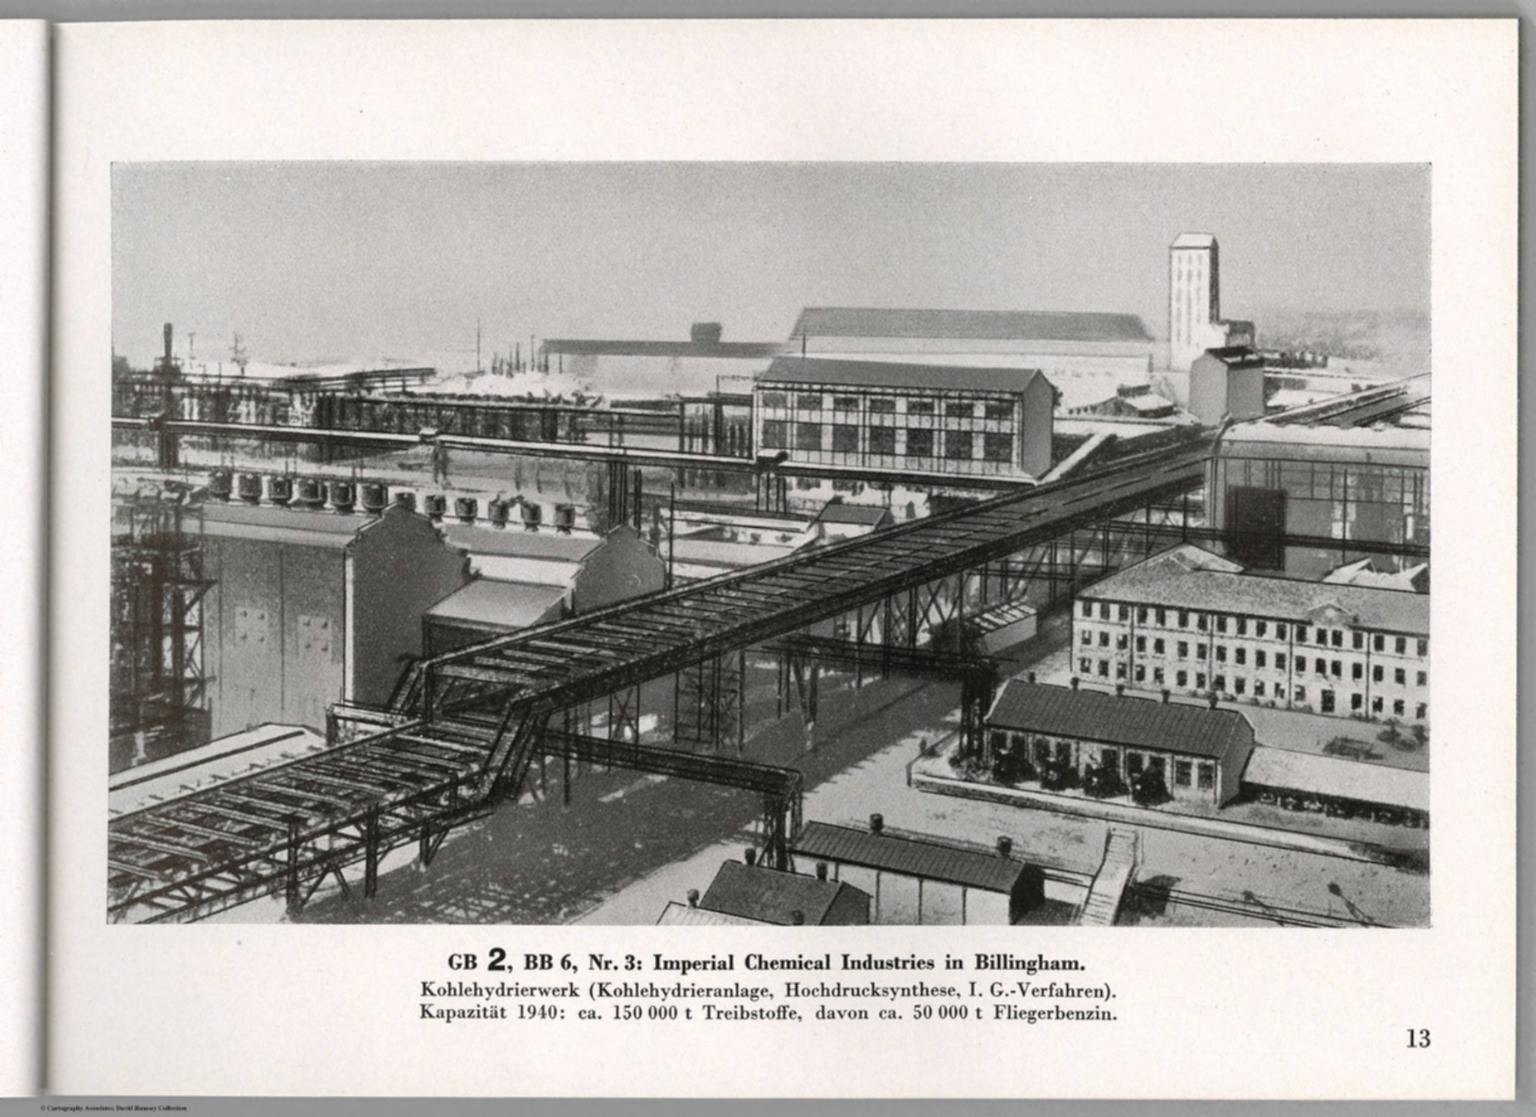 View: GB 2, BB 6, Nr. 3: Imperial Chemical Industries in Billingham ...